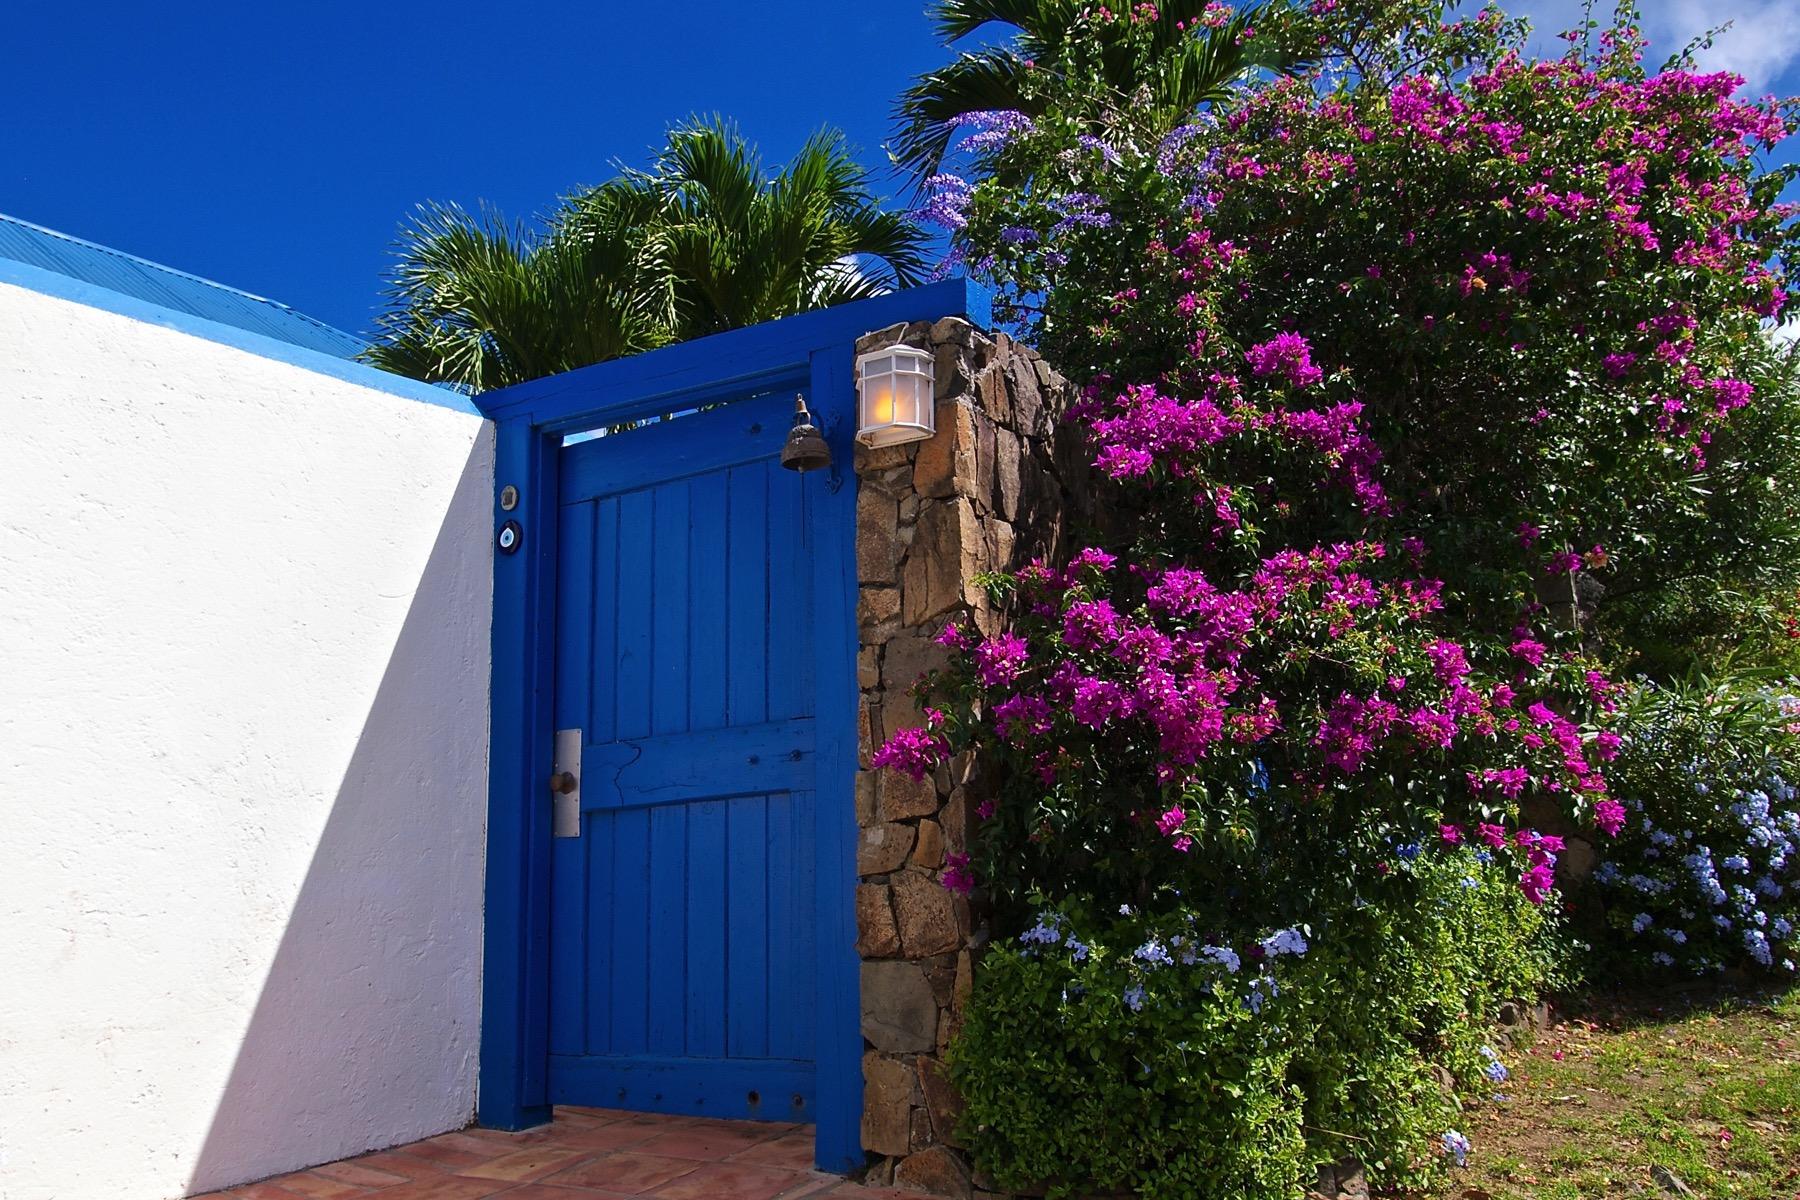 Moradia para Venda às Casablanca Other Tortola, Tortola, Ilhas Virgens Britânicas